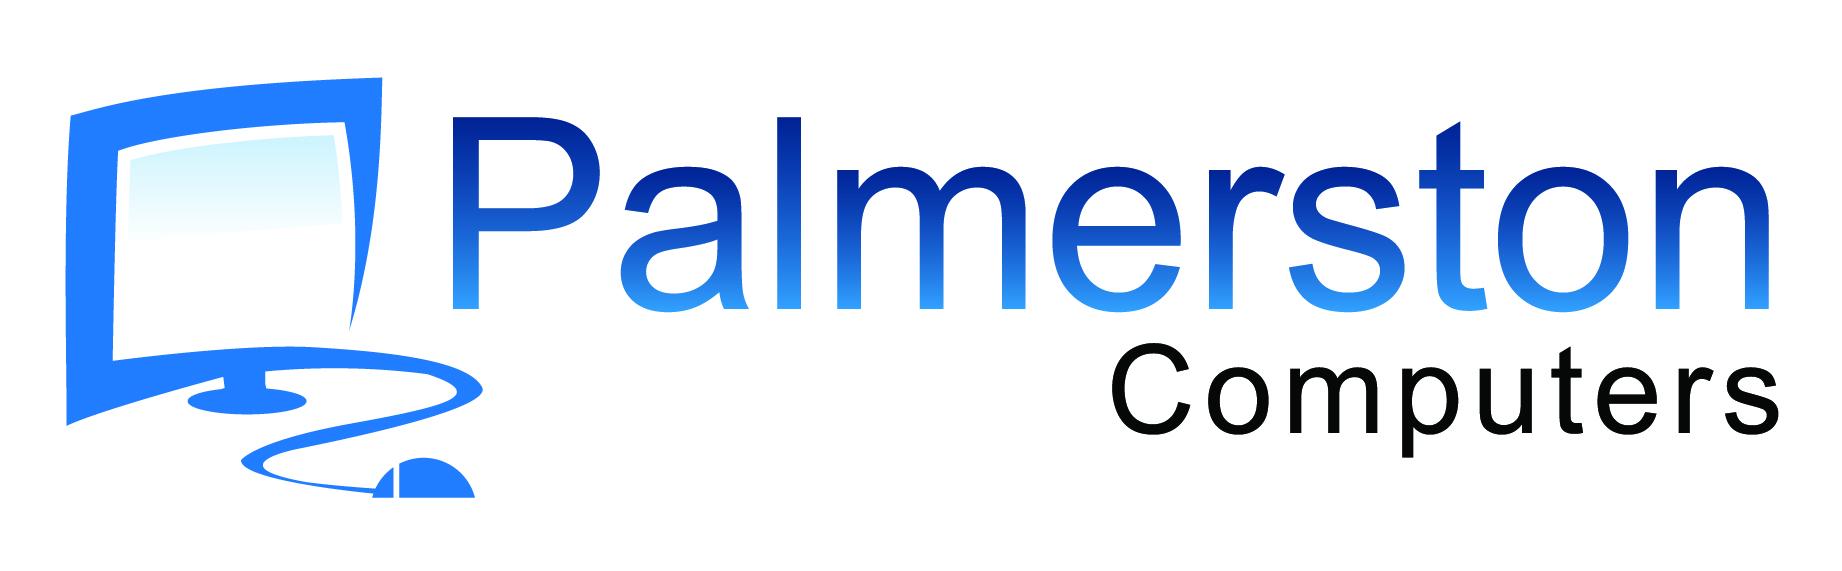 PalmerstonComputersPossibleTemplates